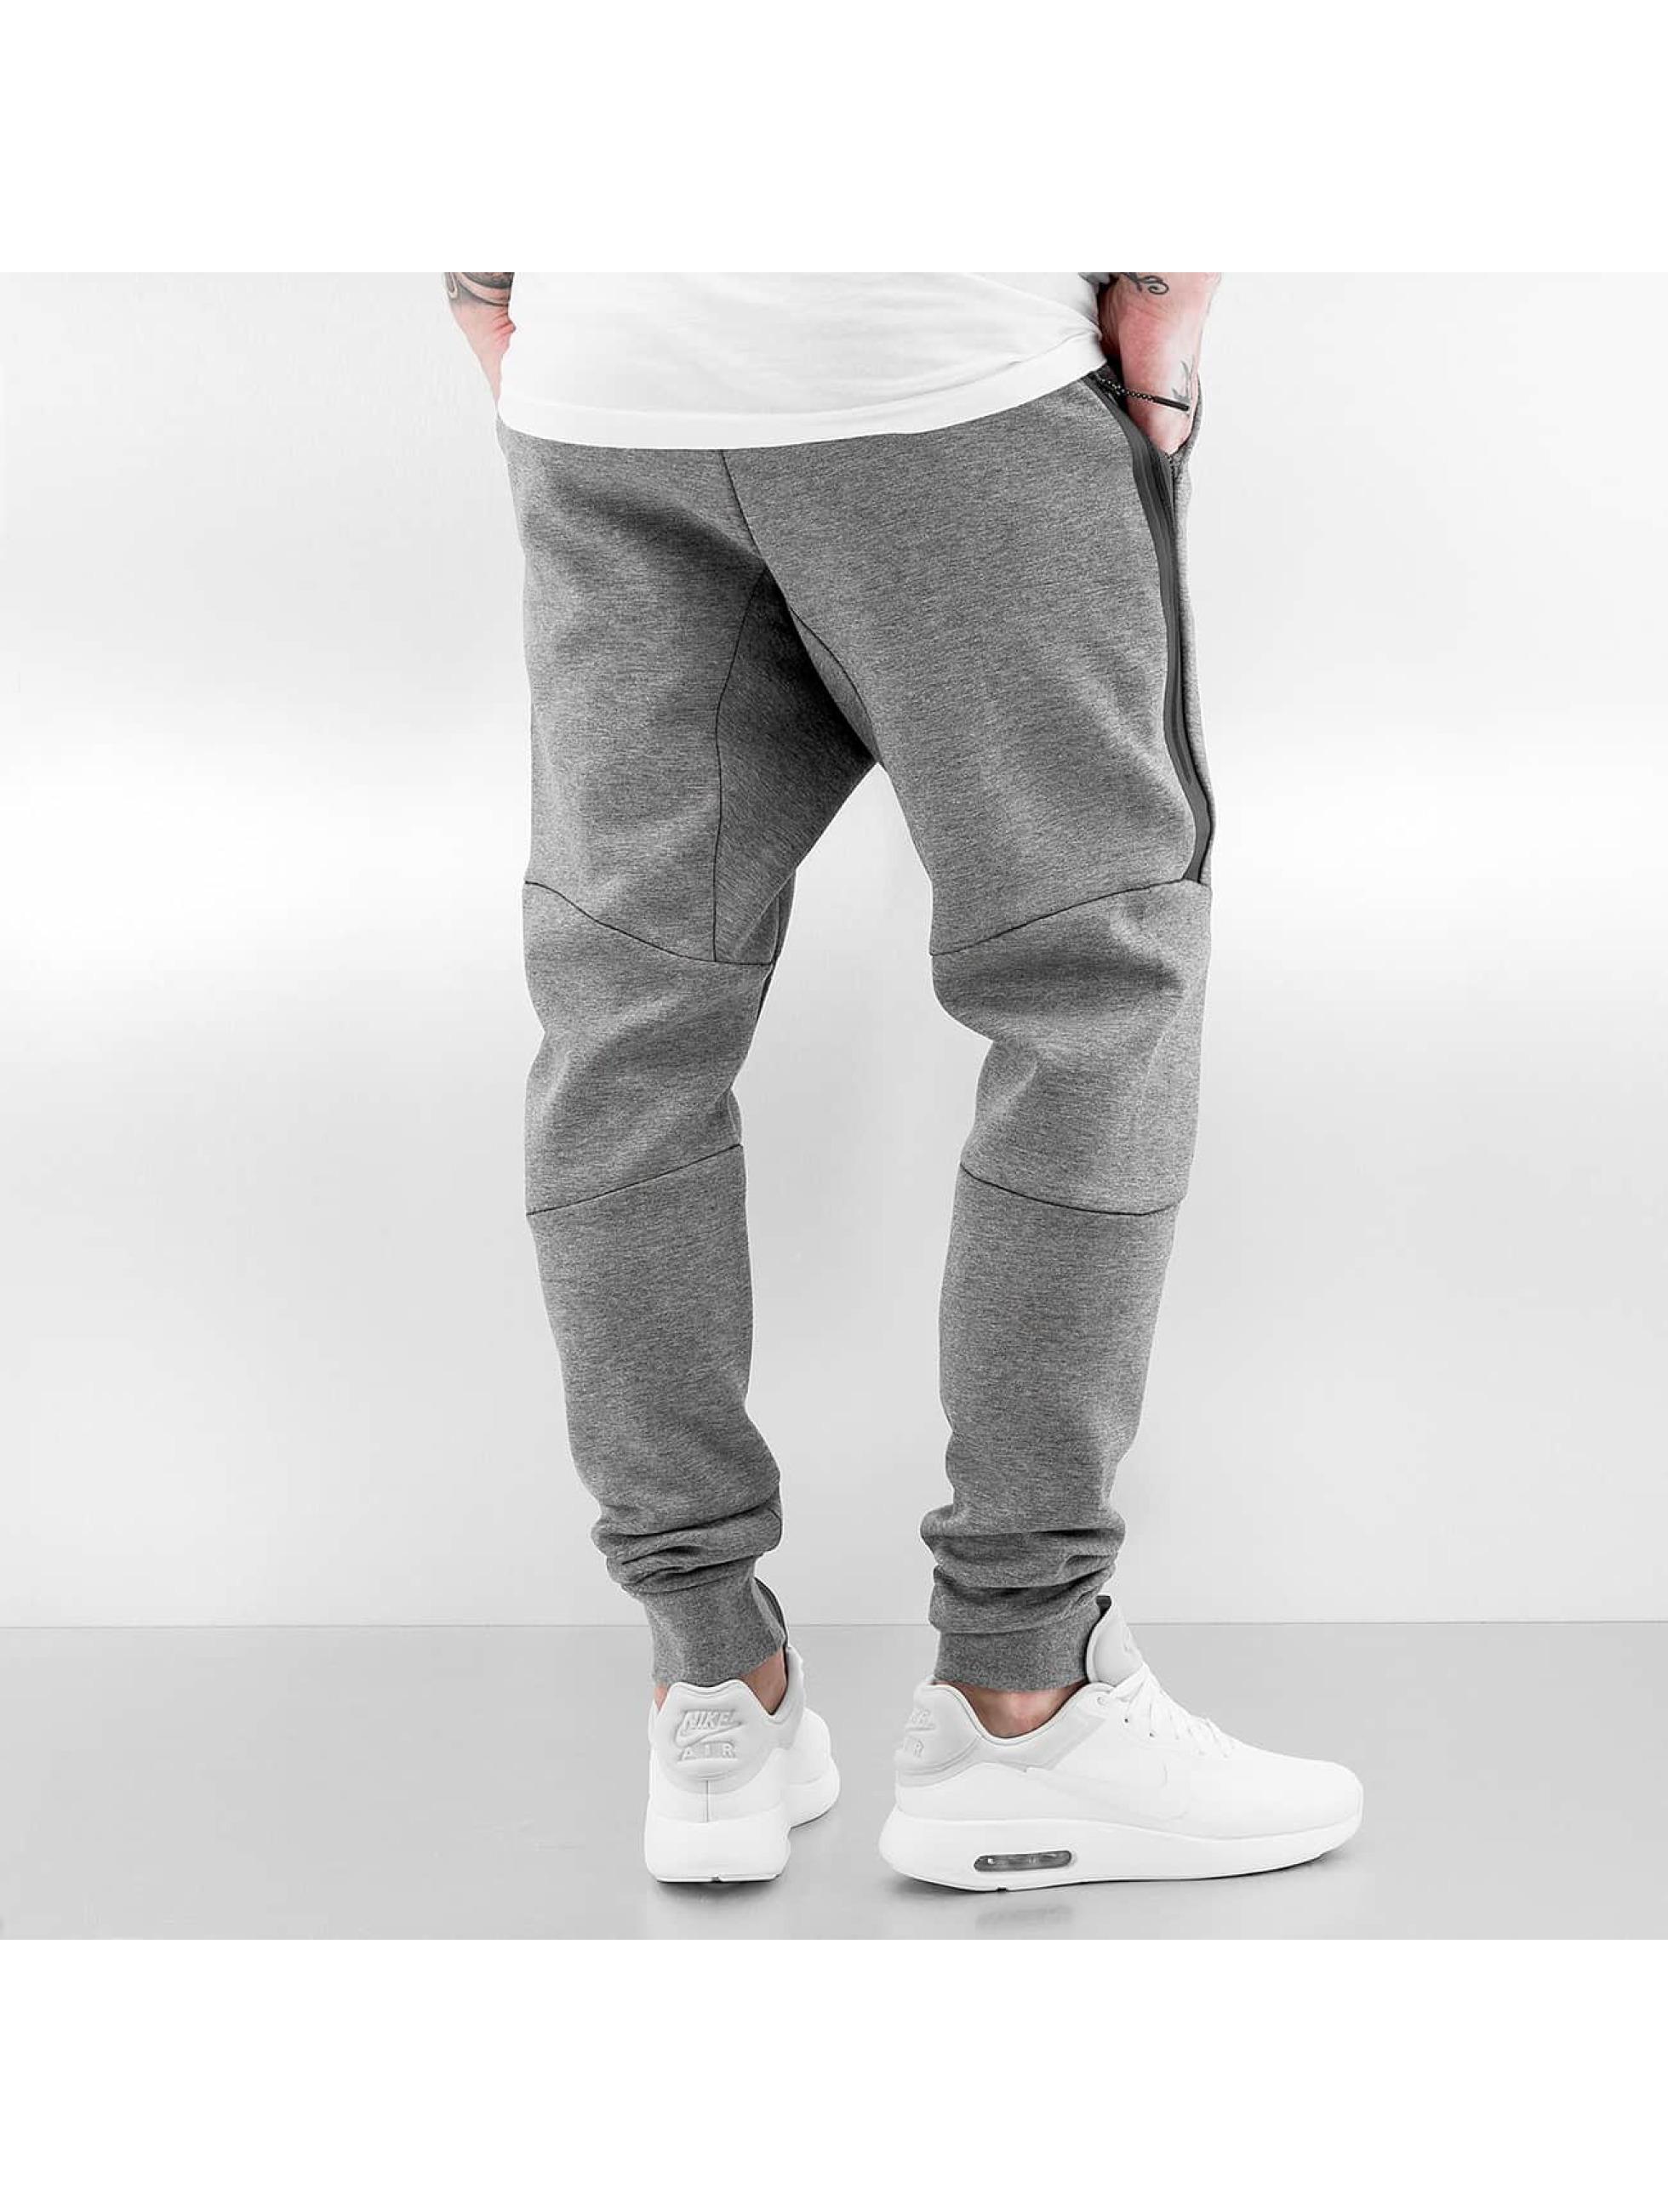 nike sportswear tech fleece gris homme jogging nike acheter pas cher pantalon 257686. Black Bedroom Furniture Sets. Home Design Ideas